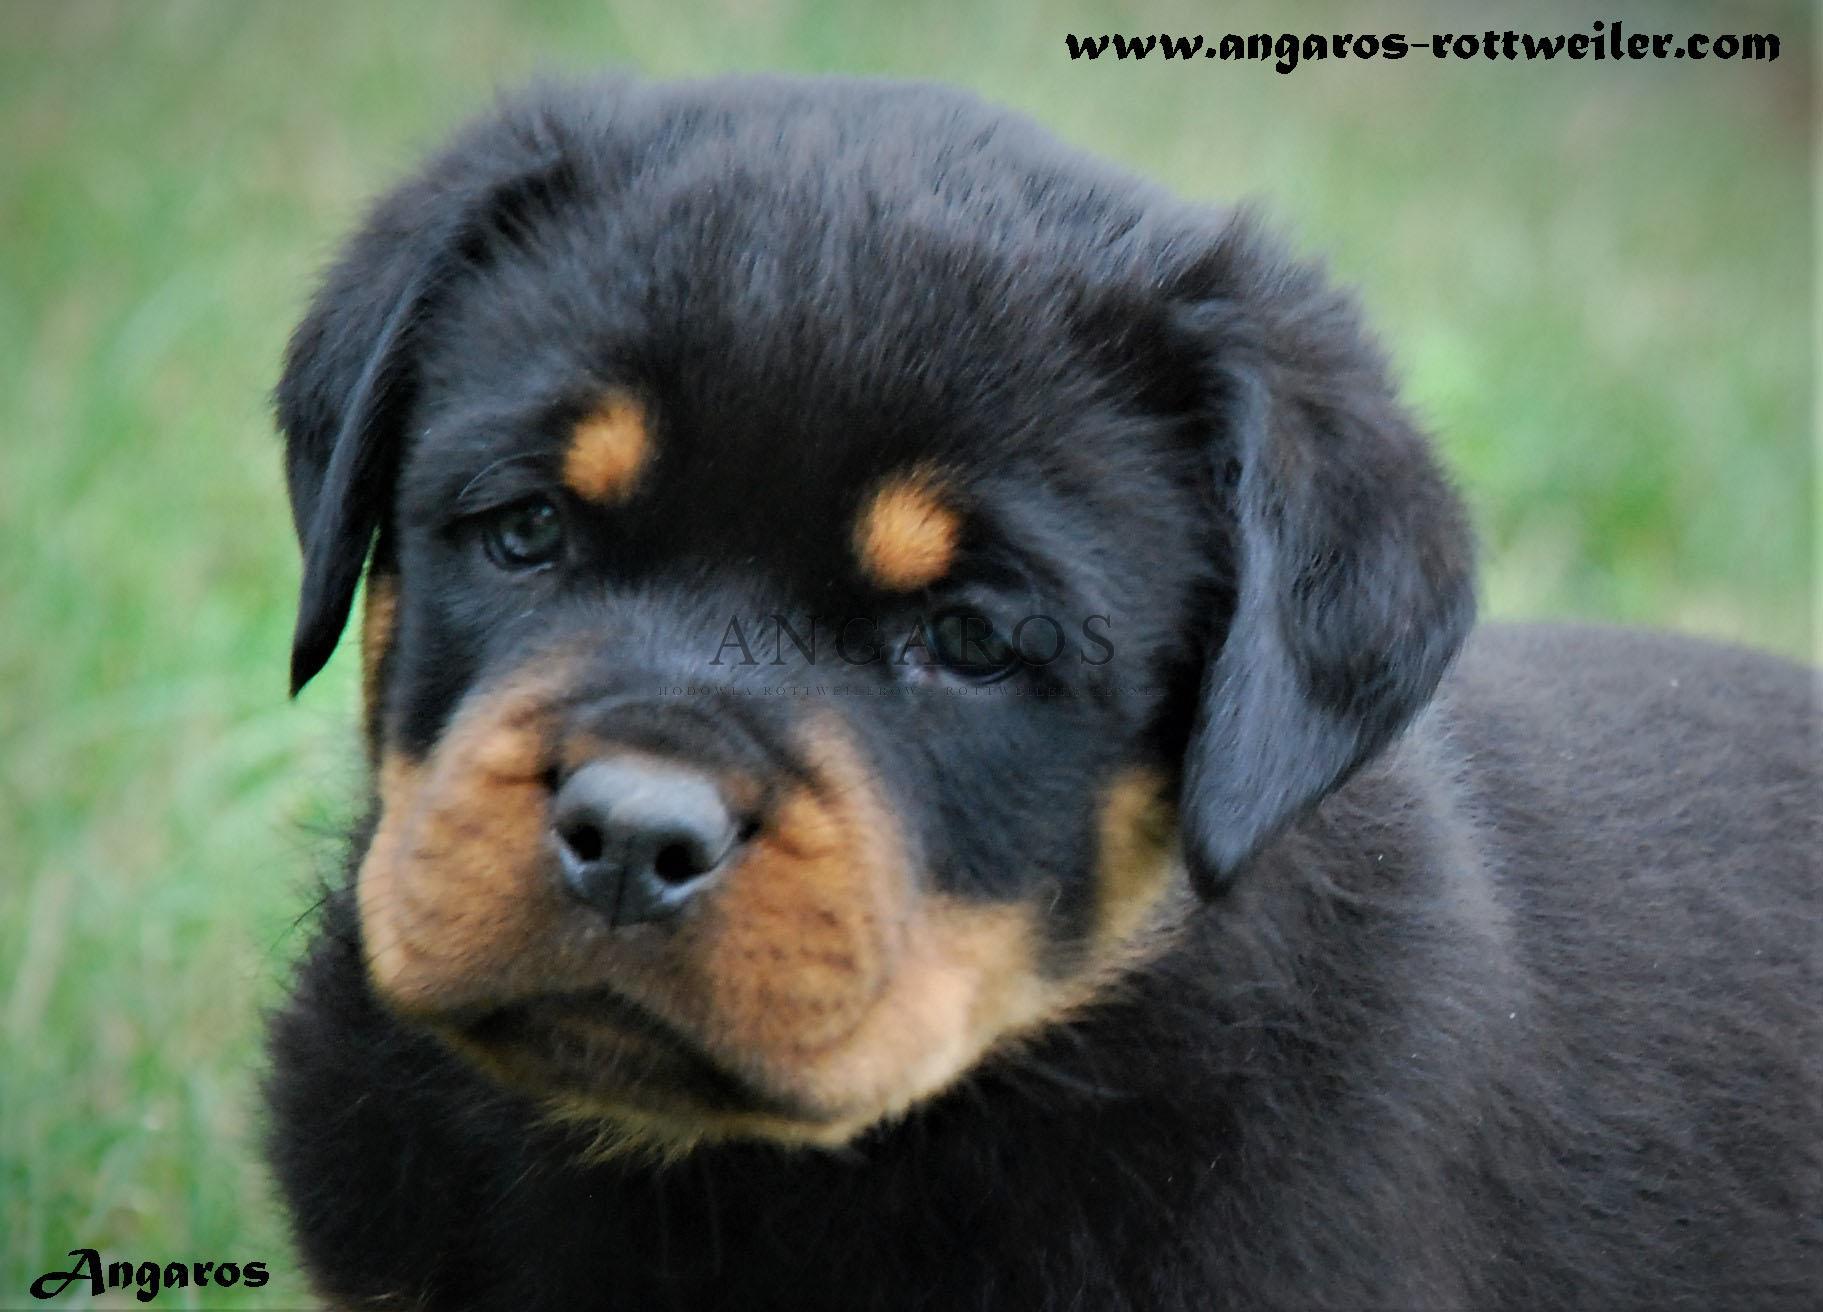 Dostępny piesek! RONALDO Angaros – 9 tygodni | Rottweiler - Hodowla Rottweilerów Angaros - Rottweilers - Rottweilery